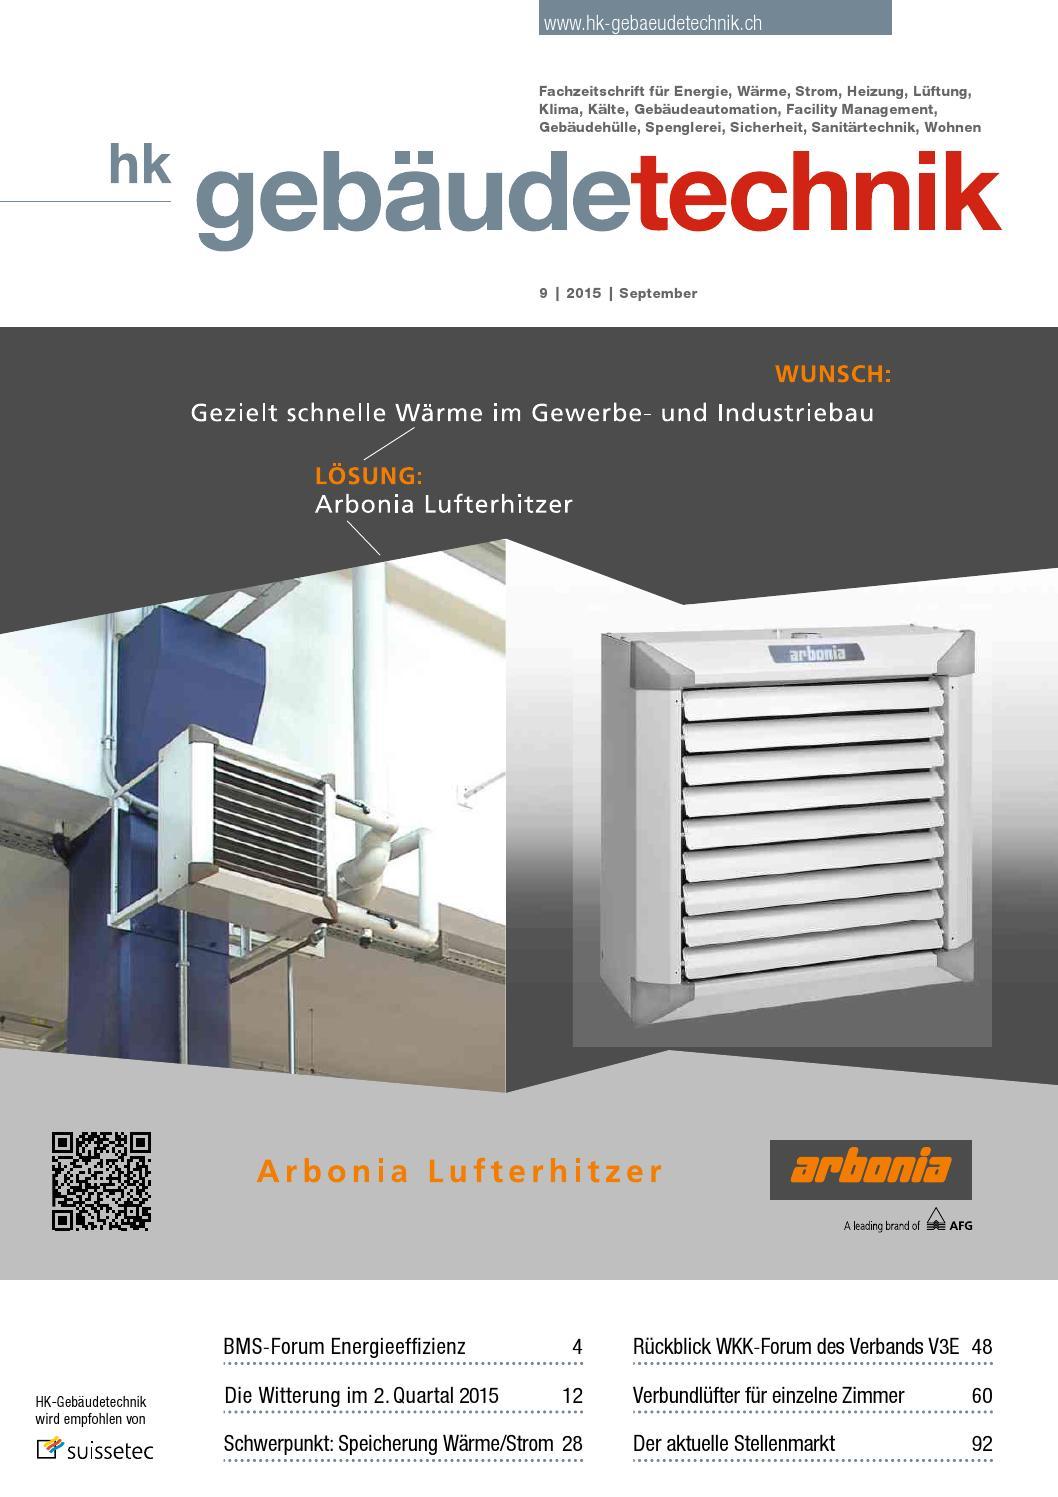 Erfreut 99 Vorstadt Schaltplan Ideen - Verdrahtungsideen - korsmi.info